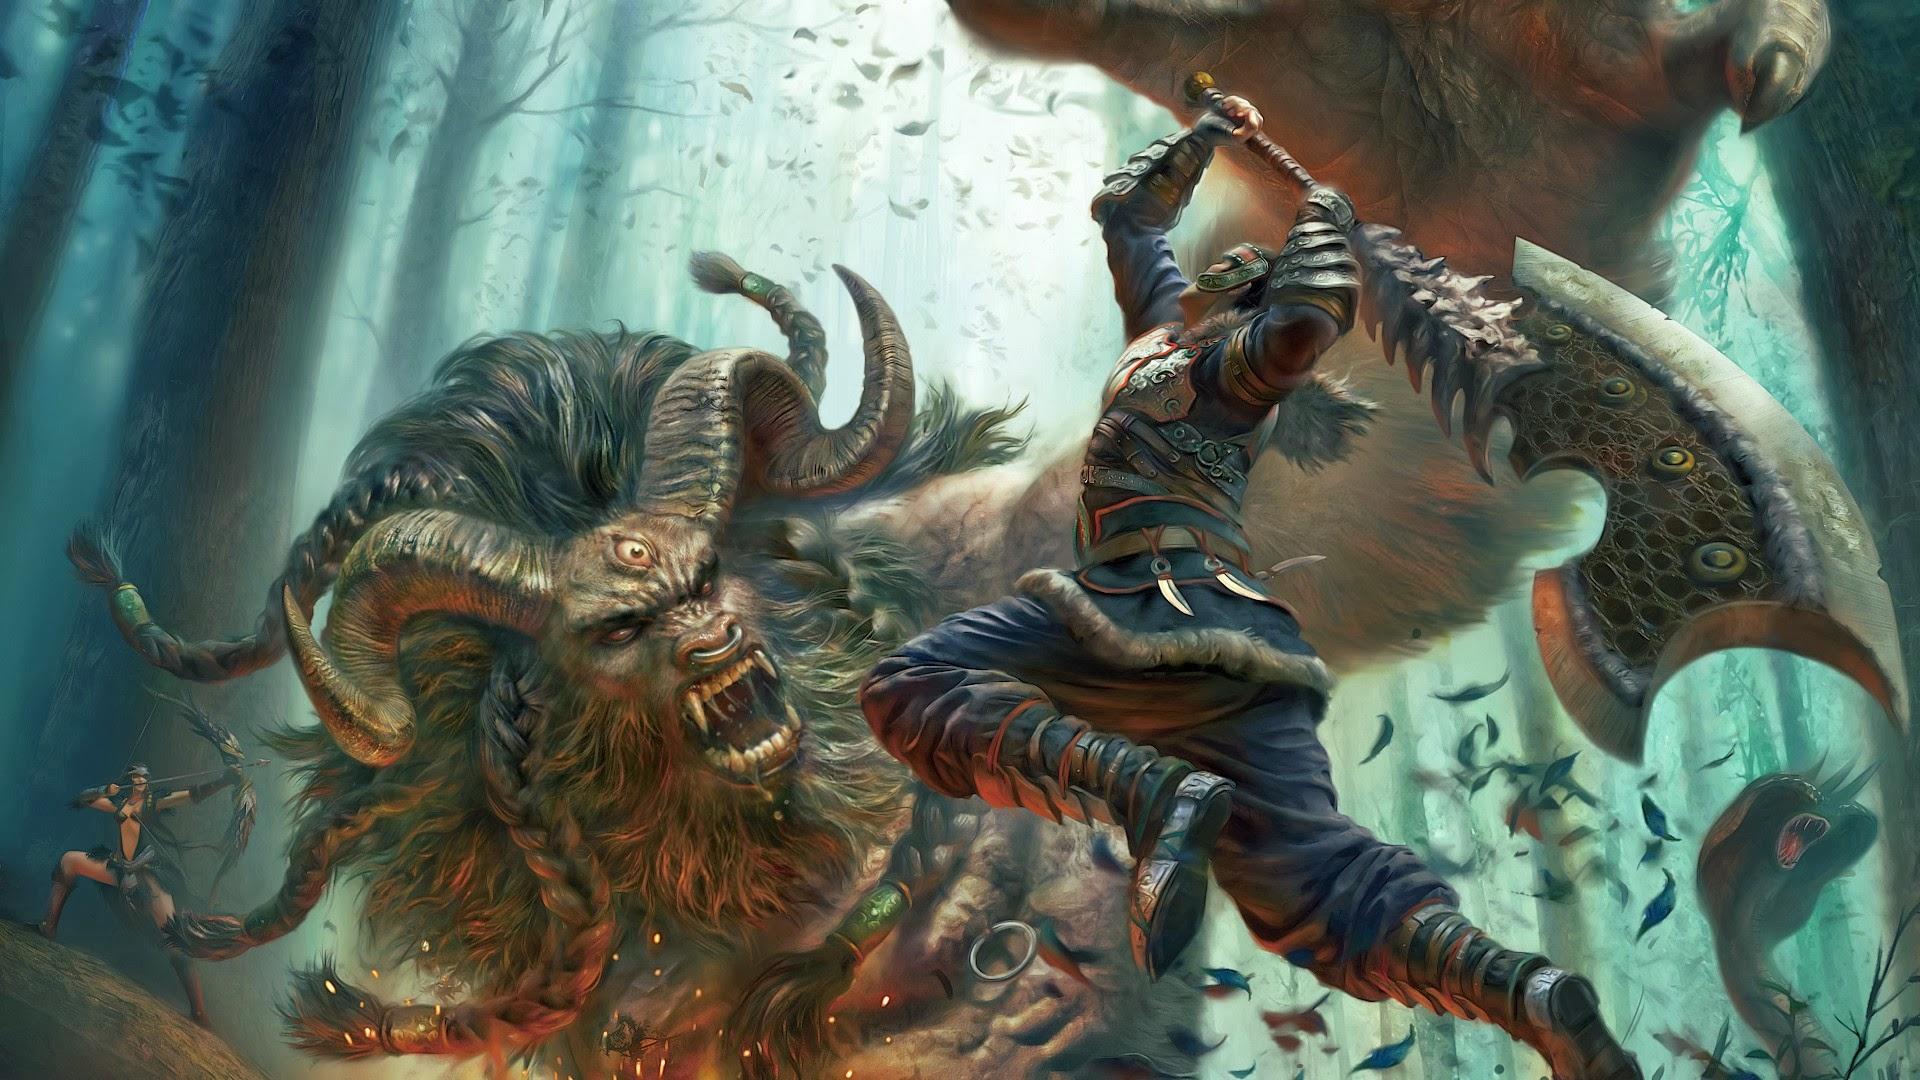 epic beast warrior fighting wallpaper hd fantasy weapon 1920x1080 a690 1920x1080